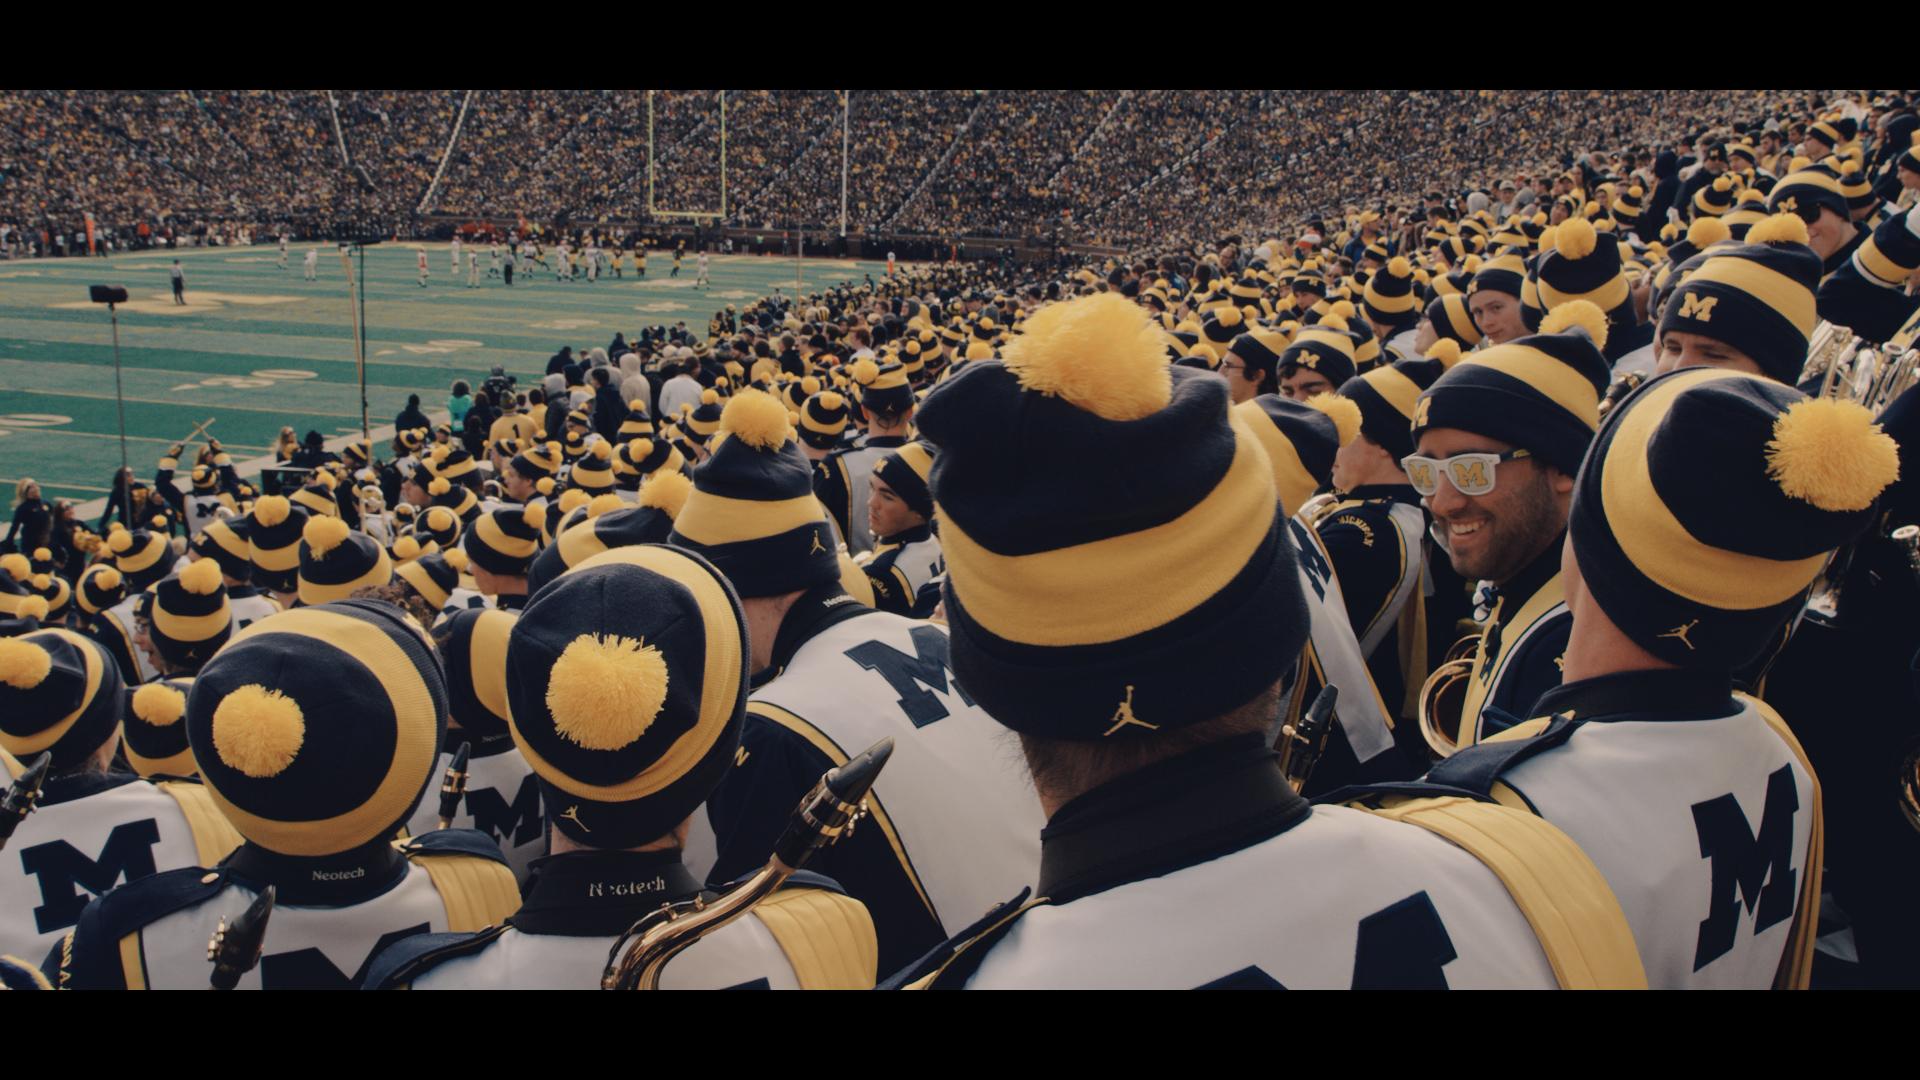 Marching Band Selected Footy.00_05_01_13.Still019.jpg